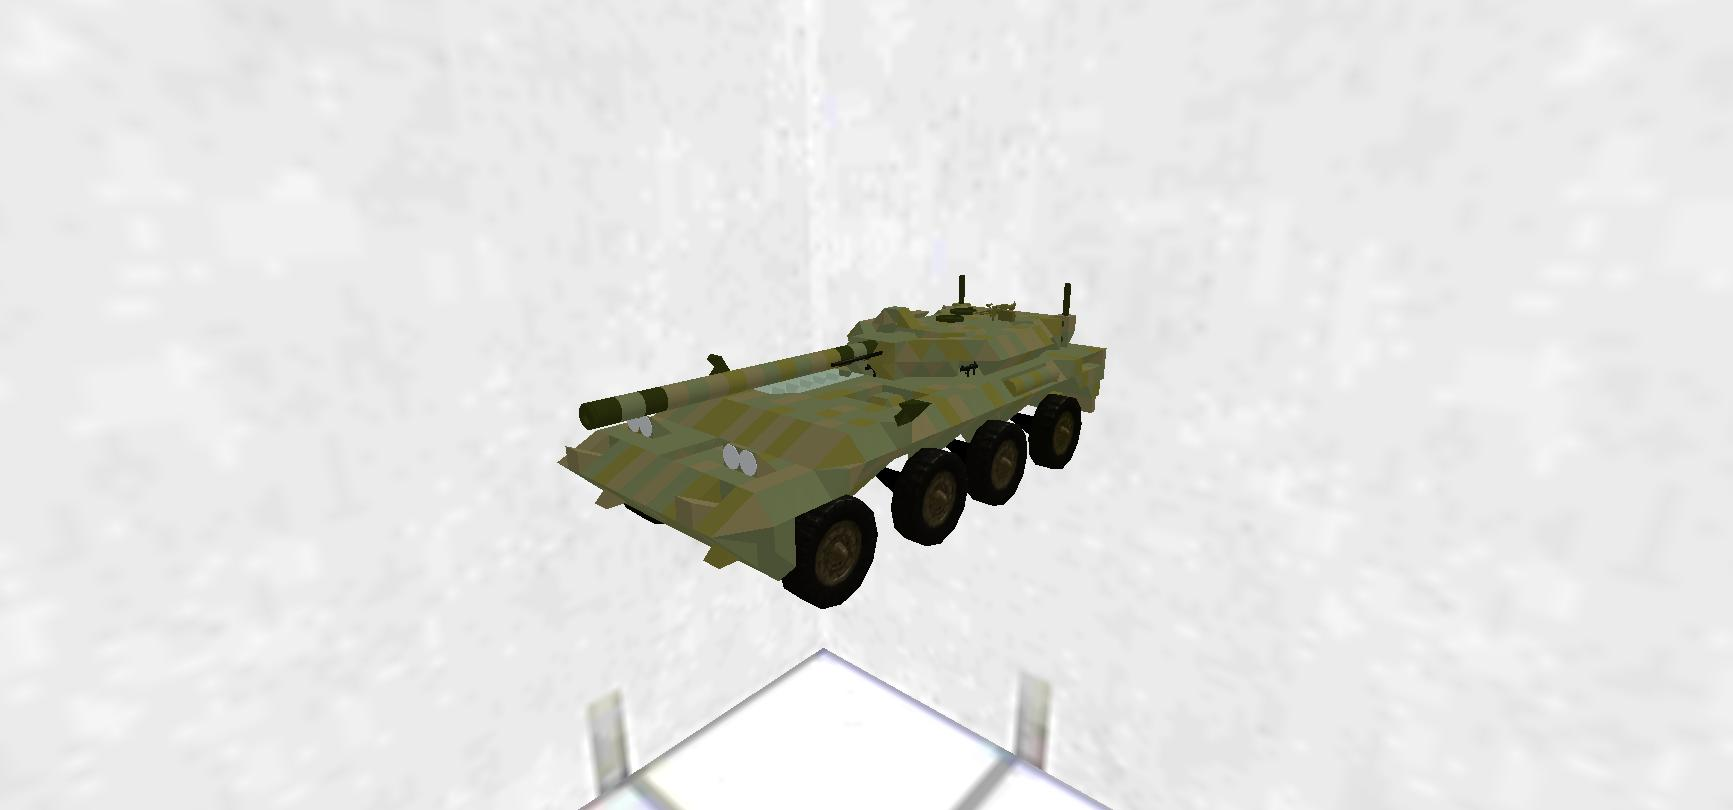 Italian wheeled tank destroyer